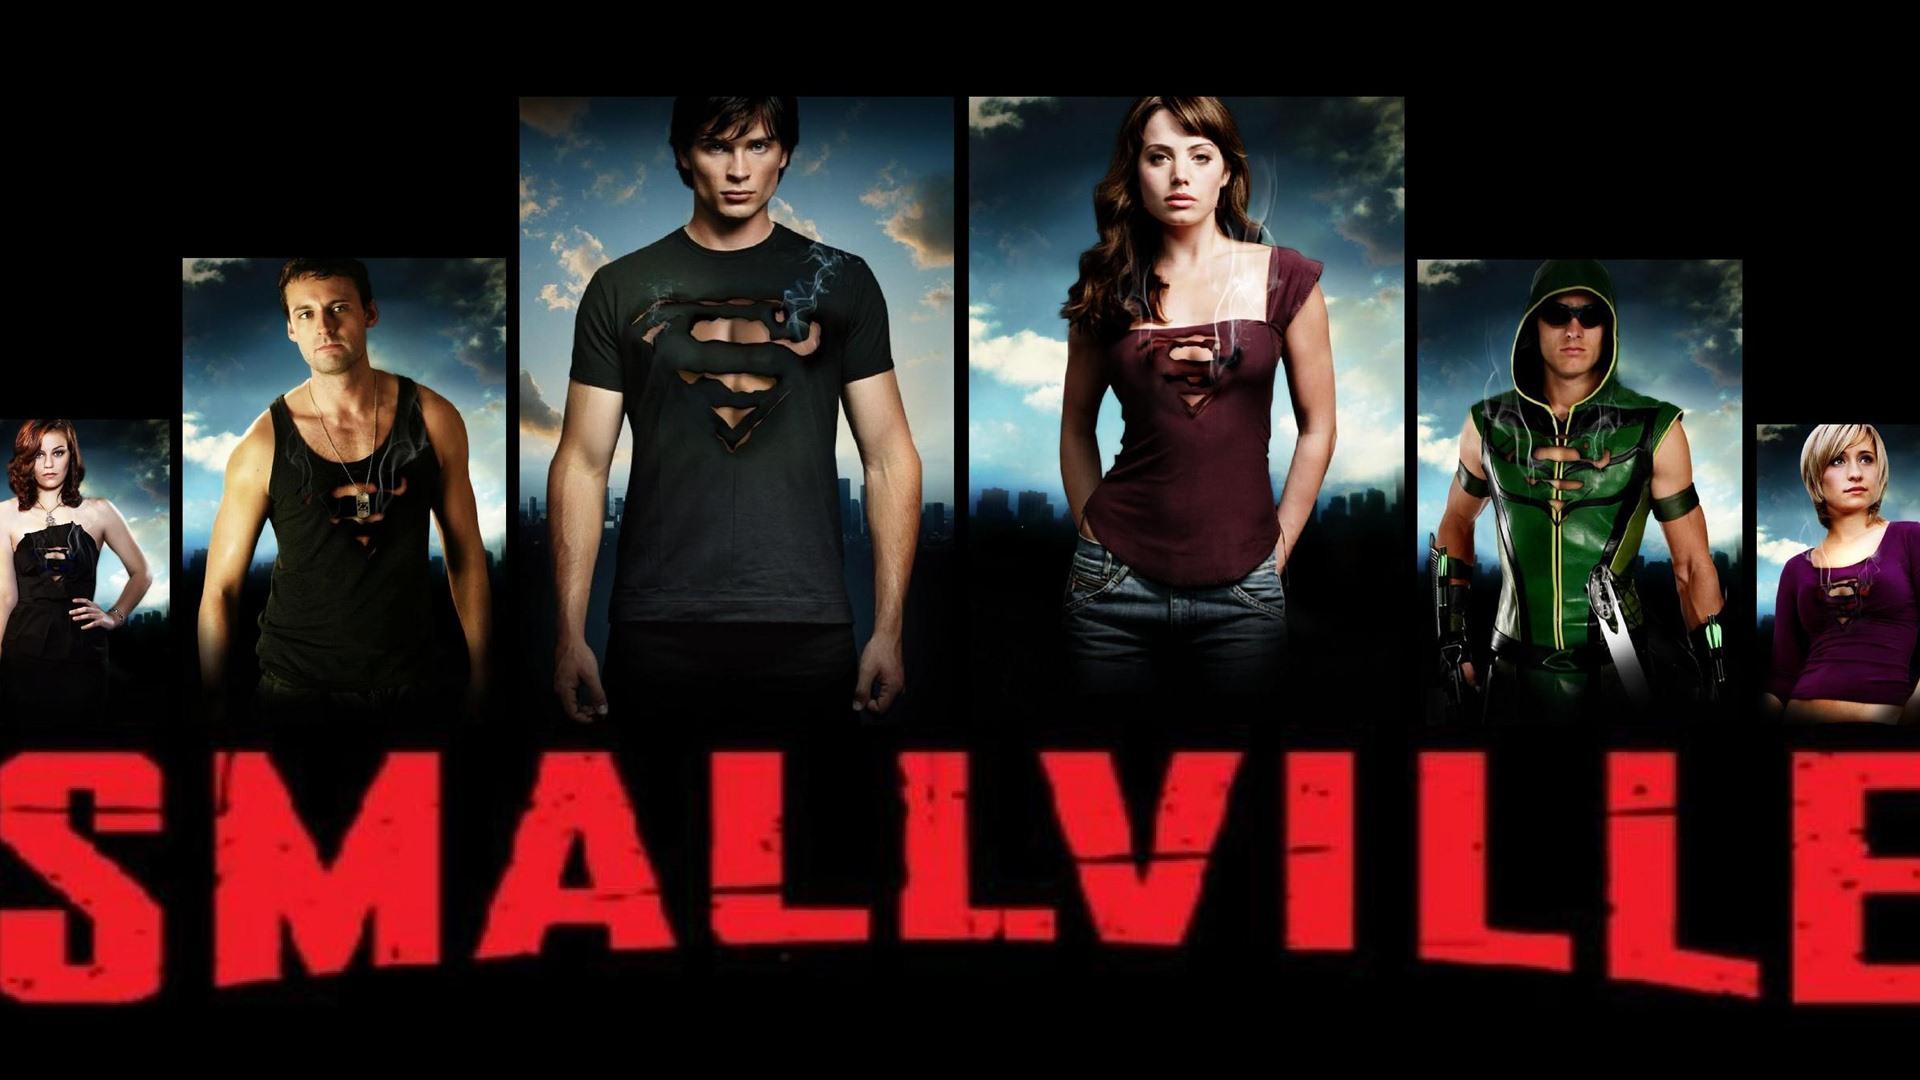 Smallville wallpaper 3